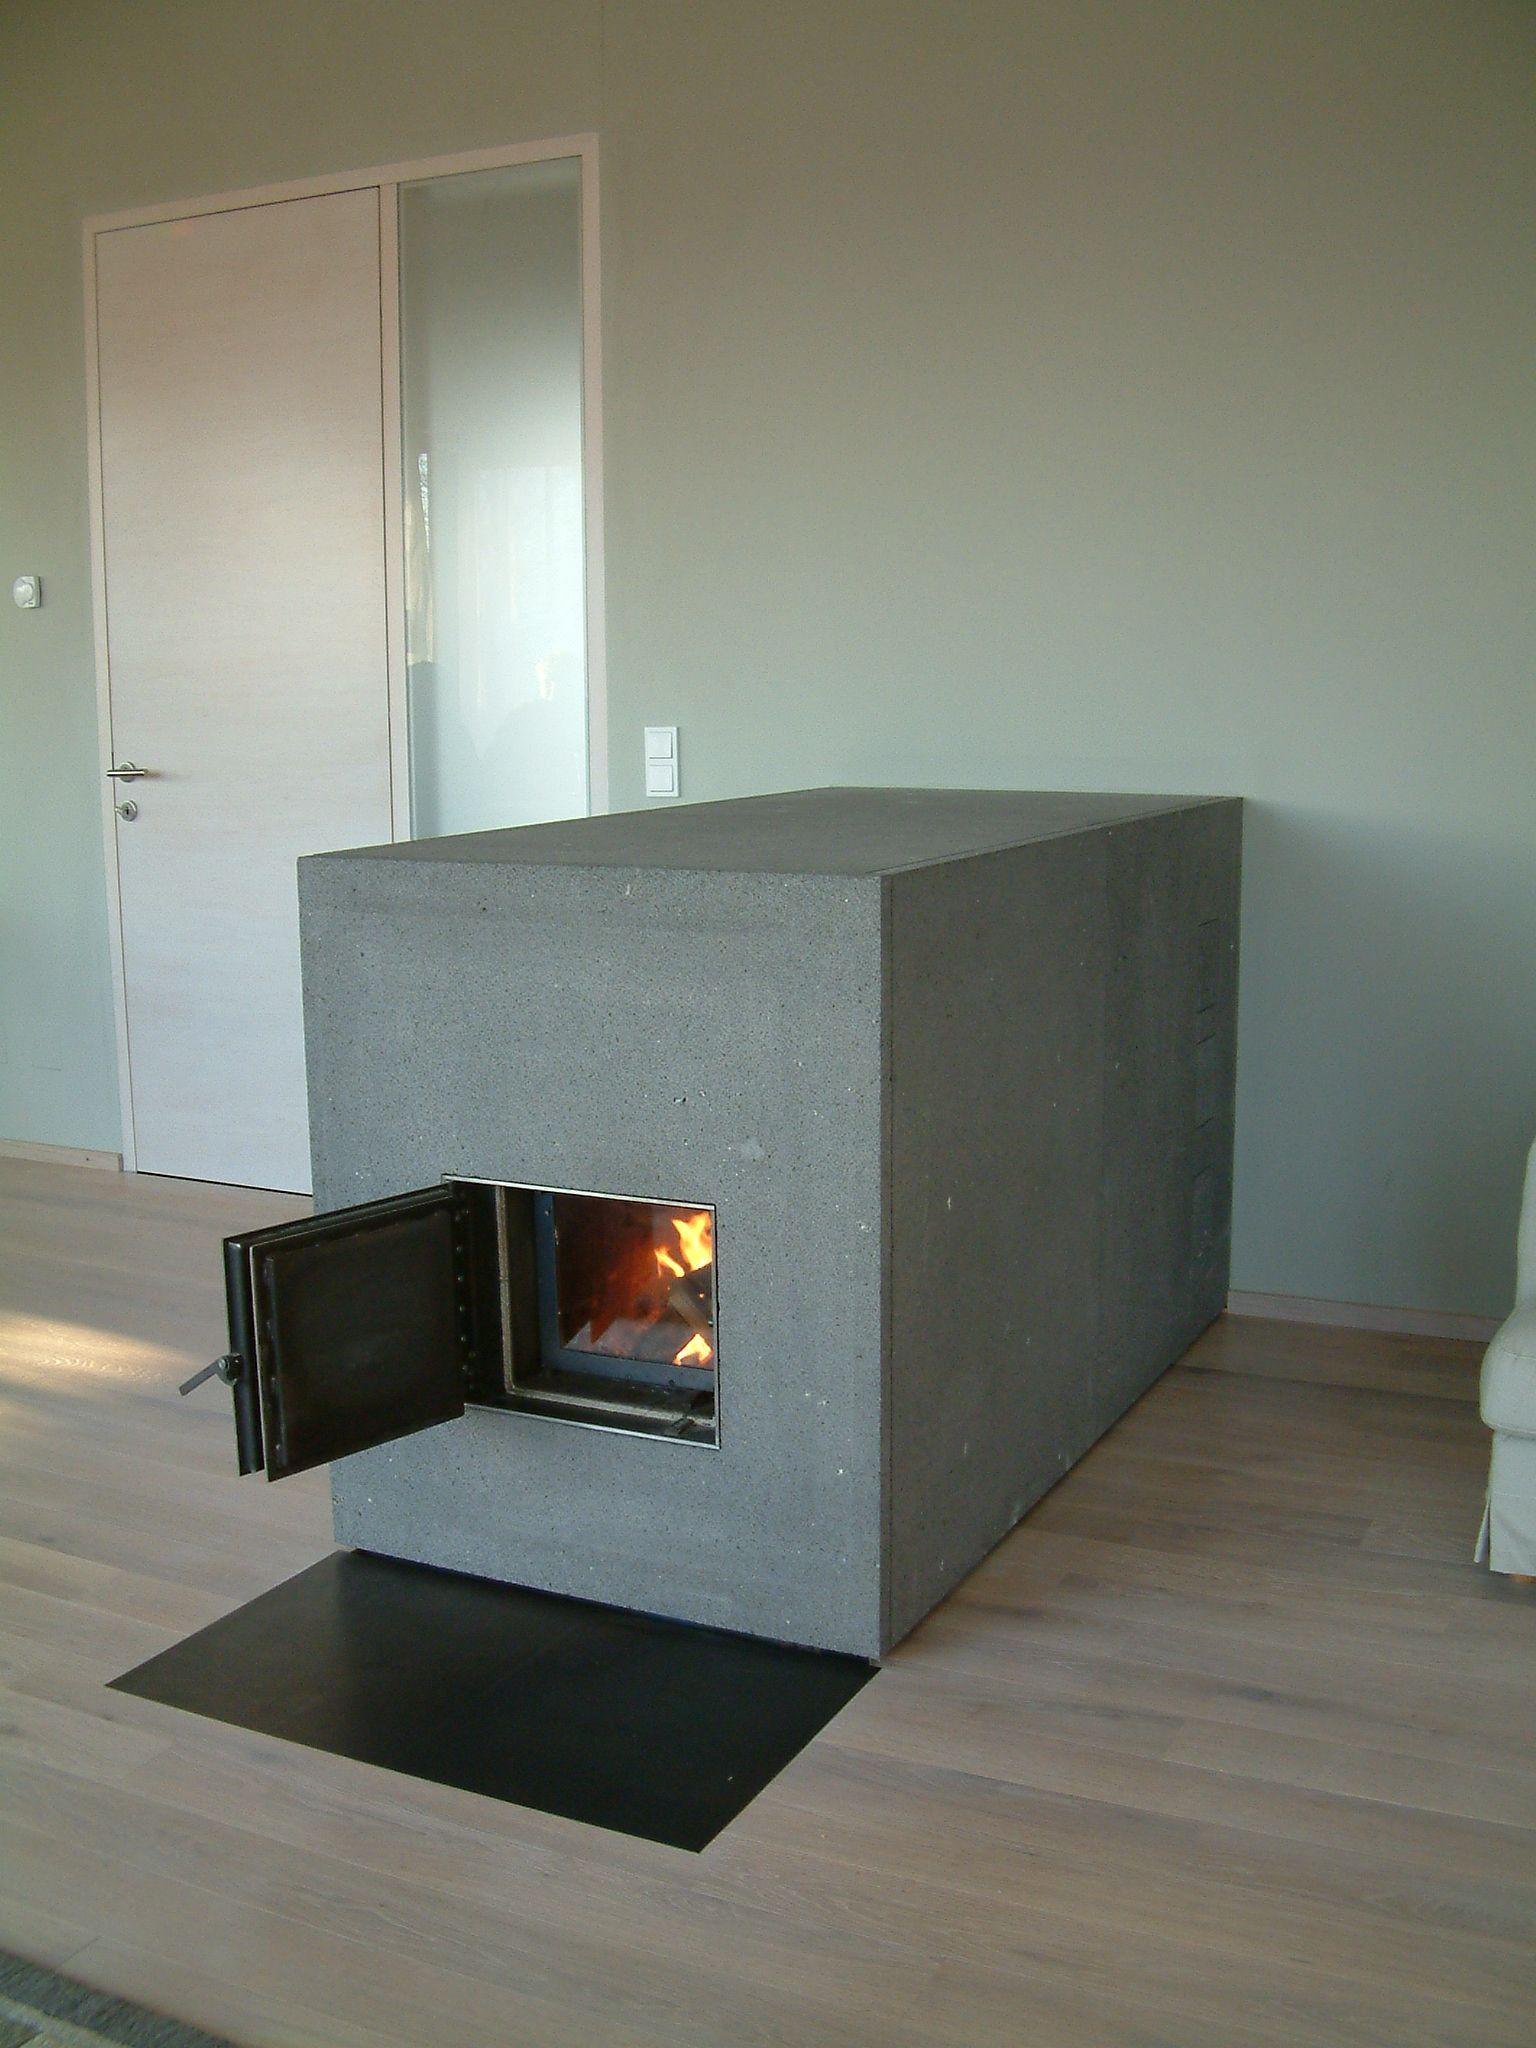 ofen stein b rnbach steiermark j rgen rajh cookin 39 kachelofen pinterest ofen. Black Bedroom Furniture Sets. Home Design Ideas